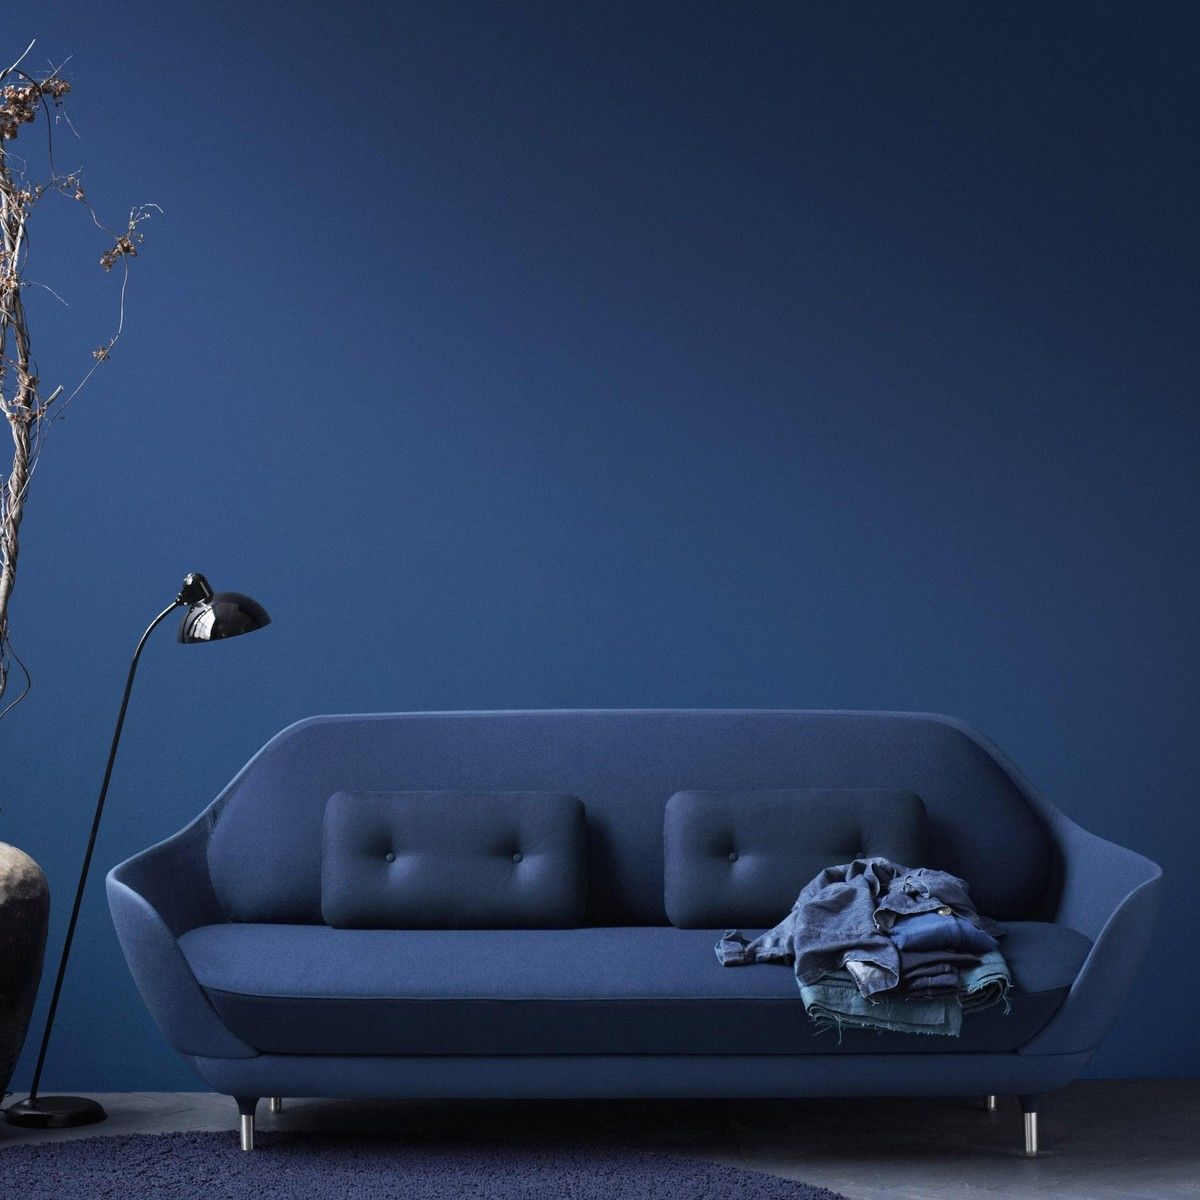 kaiser idell 6556 f super lampadaire kaiser idell. Black Bedroom Furniture Sets. Home Design Ideas